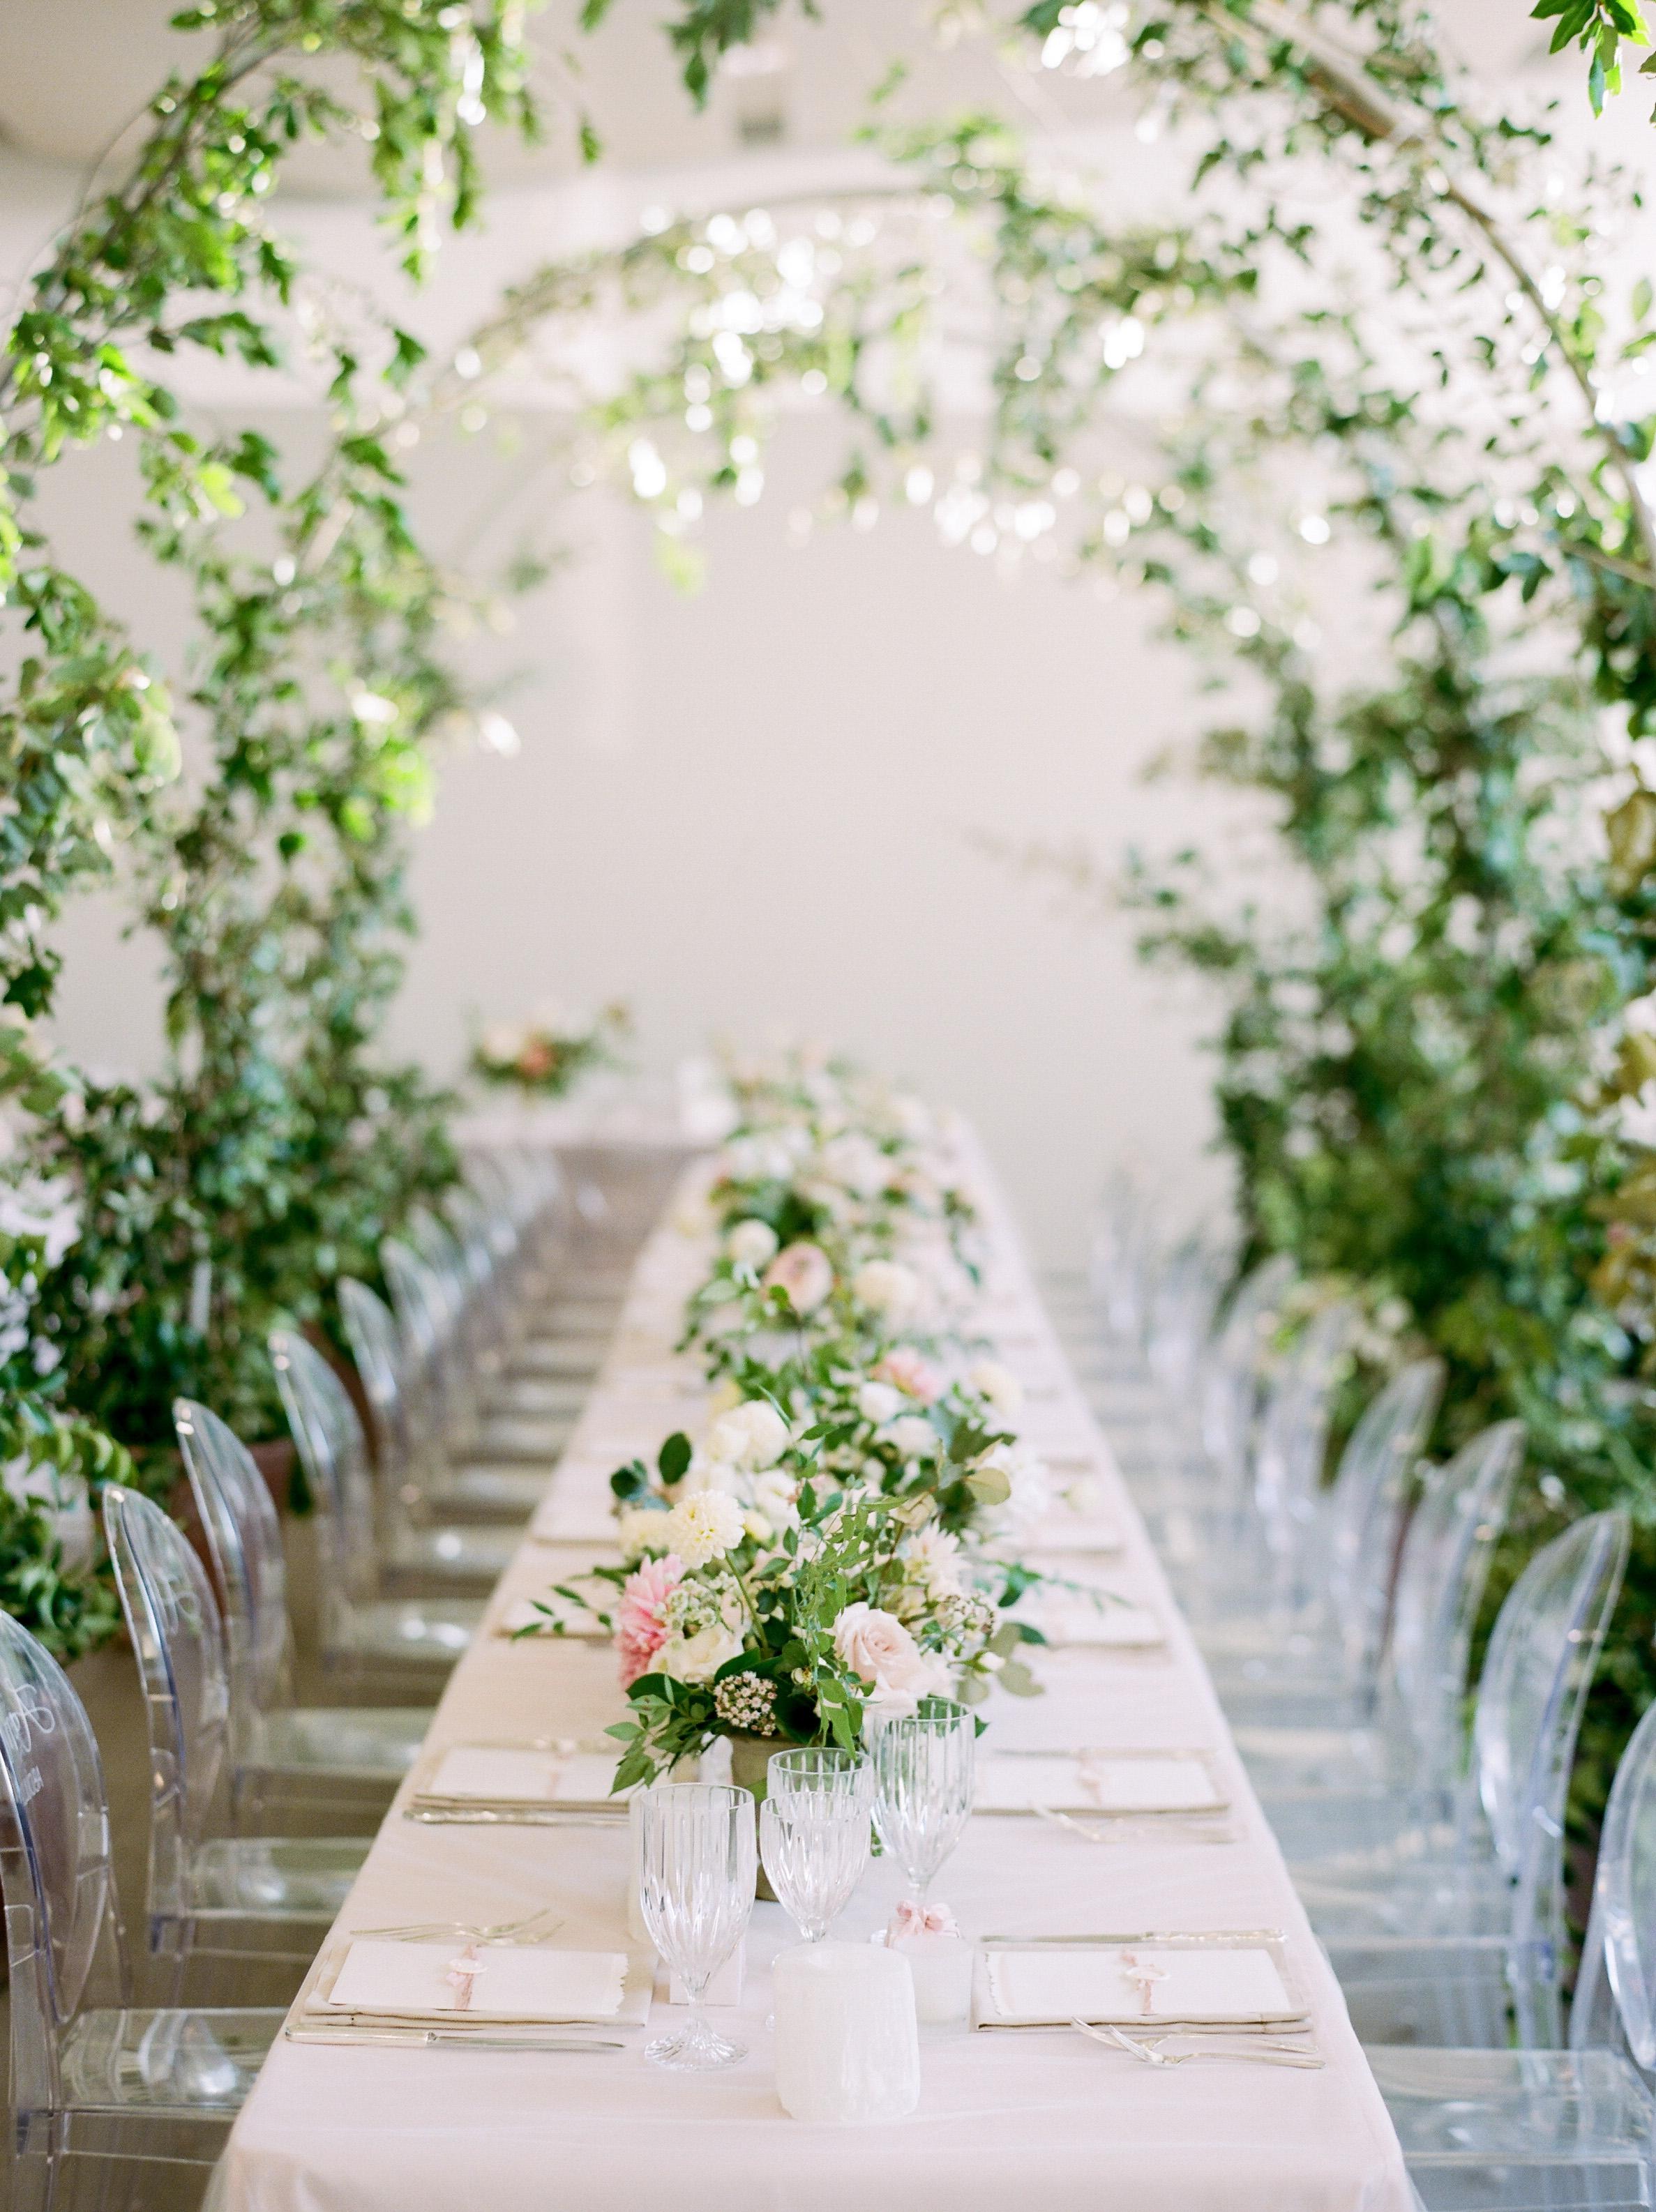 Martha-Stewart-Wedding-Dana-Fernandez-Photography-Josh-Texas-Film-Houston-Wedding-Fine-Art-Photographer-McGovern-Centennial-Gardens-Top-Best-211.jpg